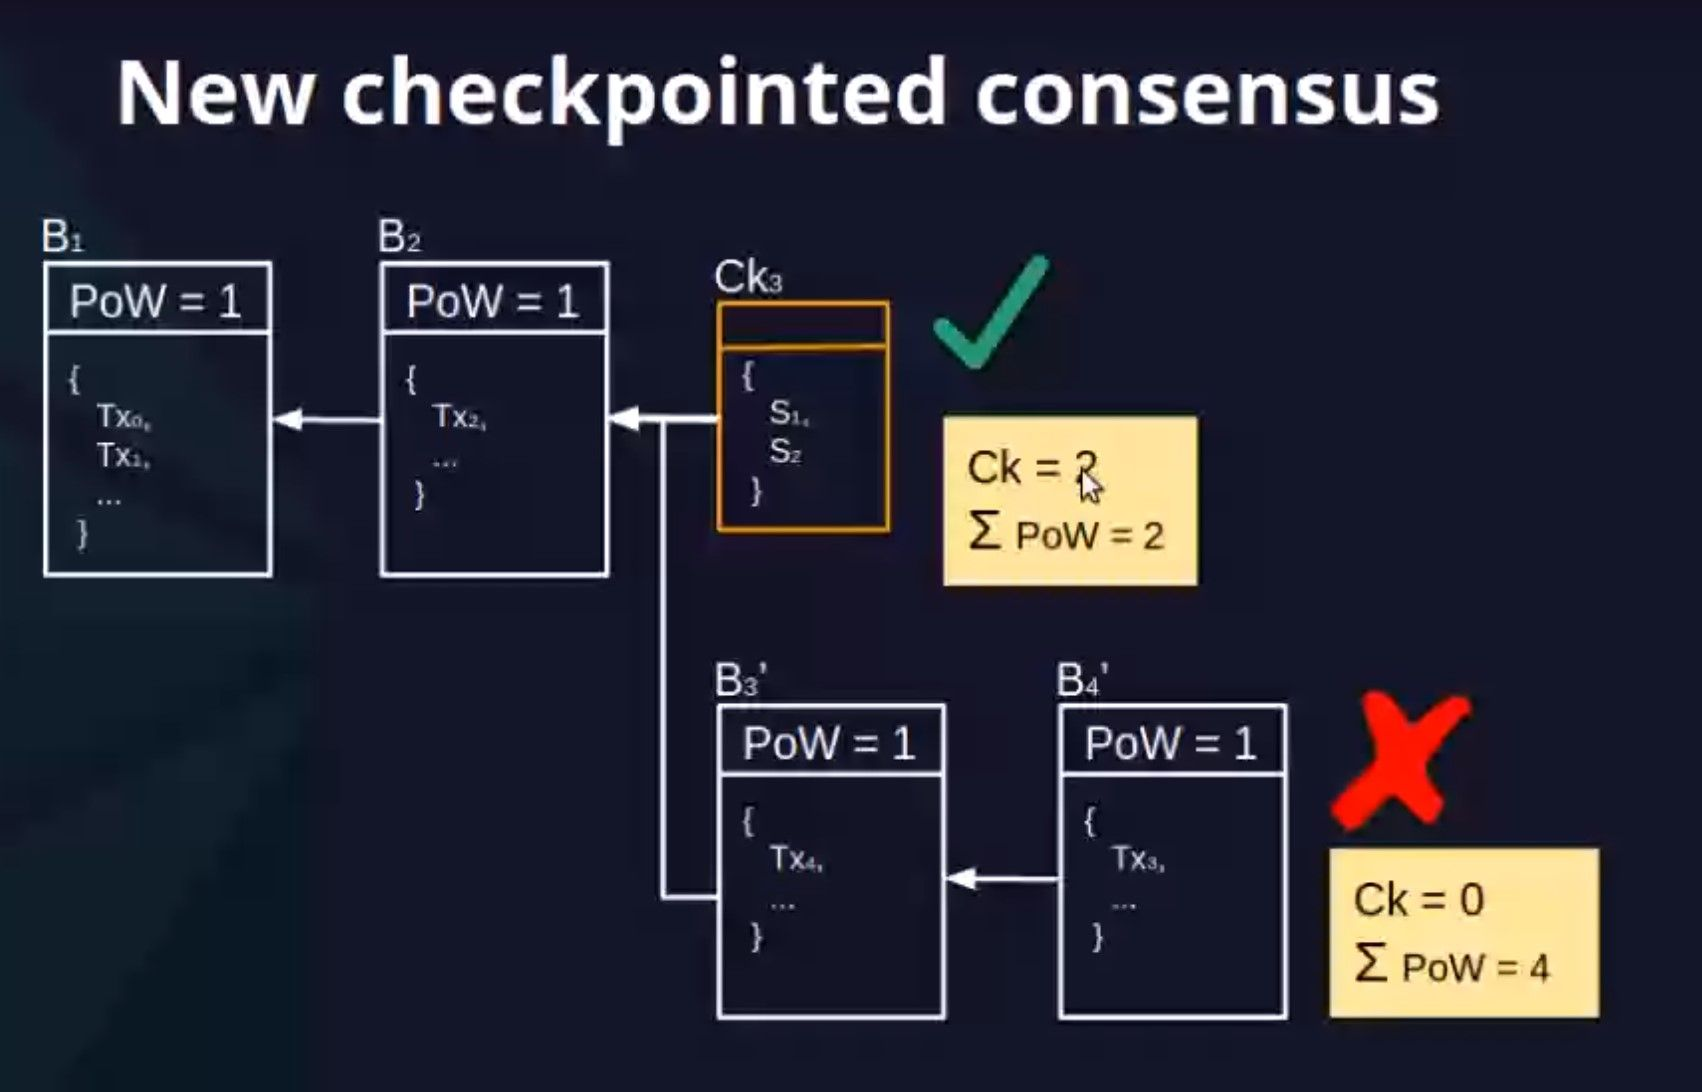 050920_ETC_checkpoints.jpg